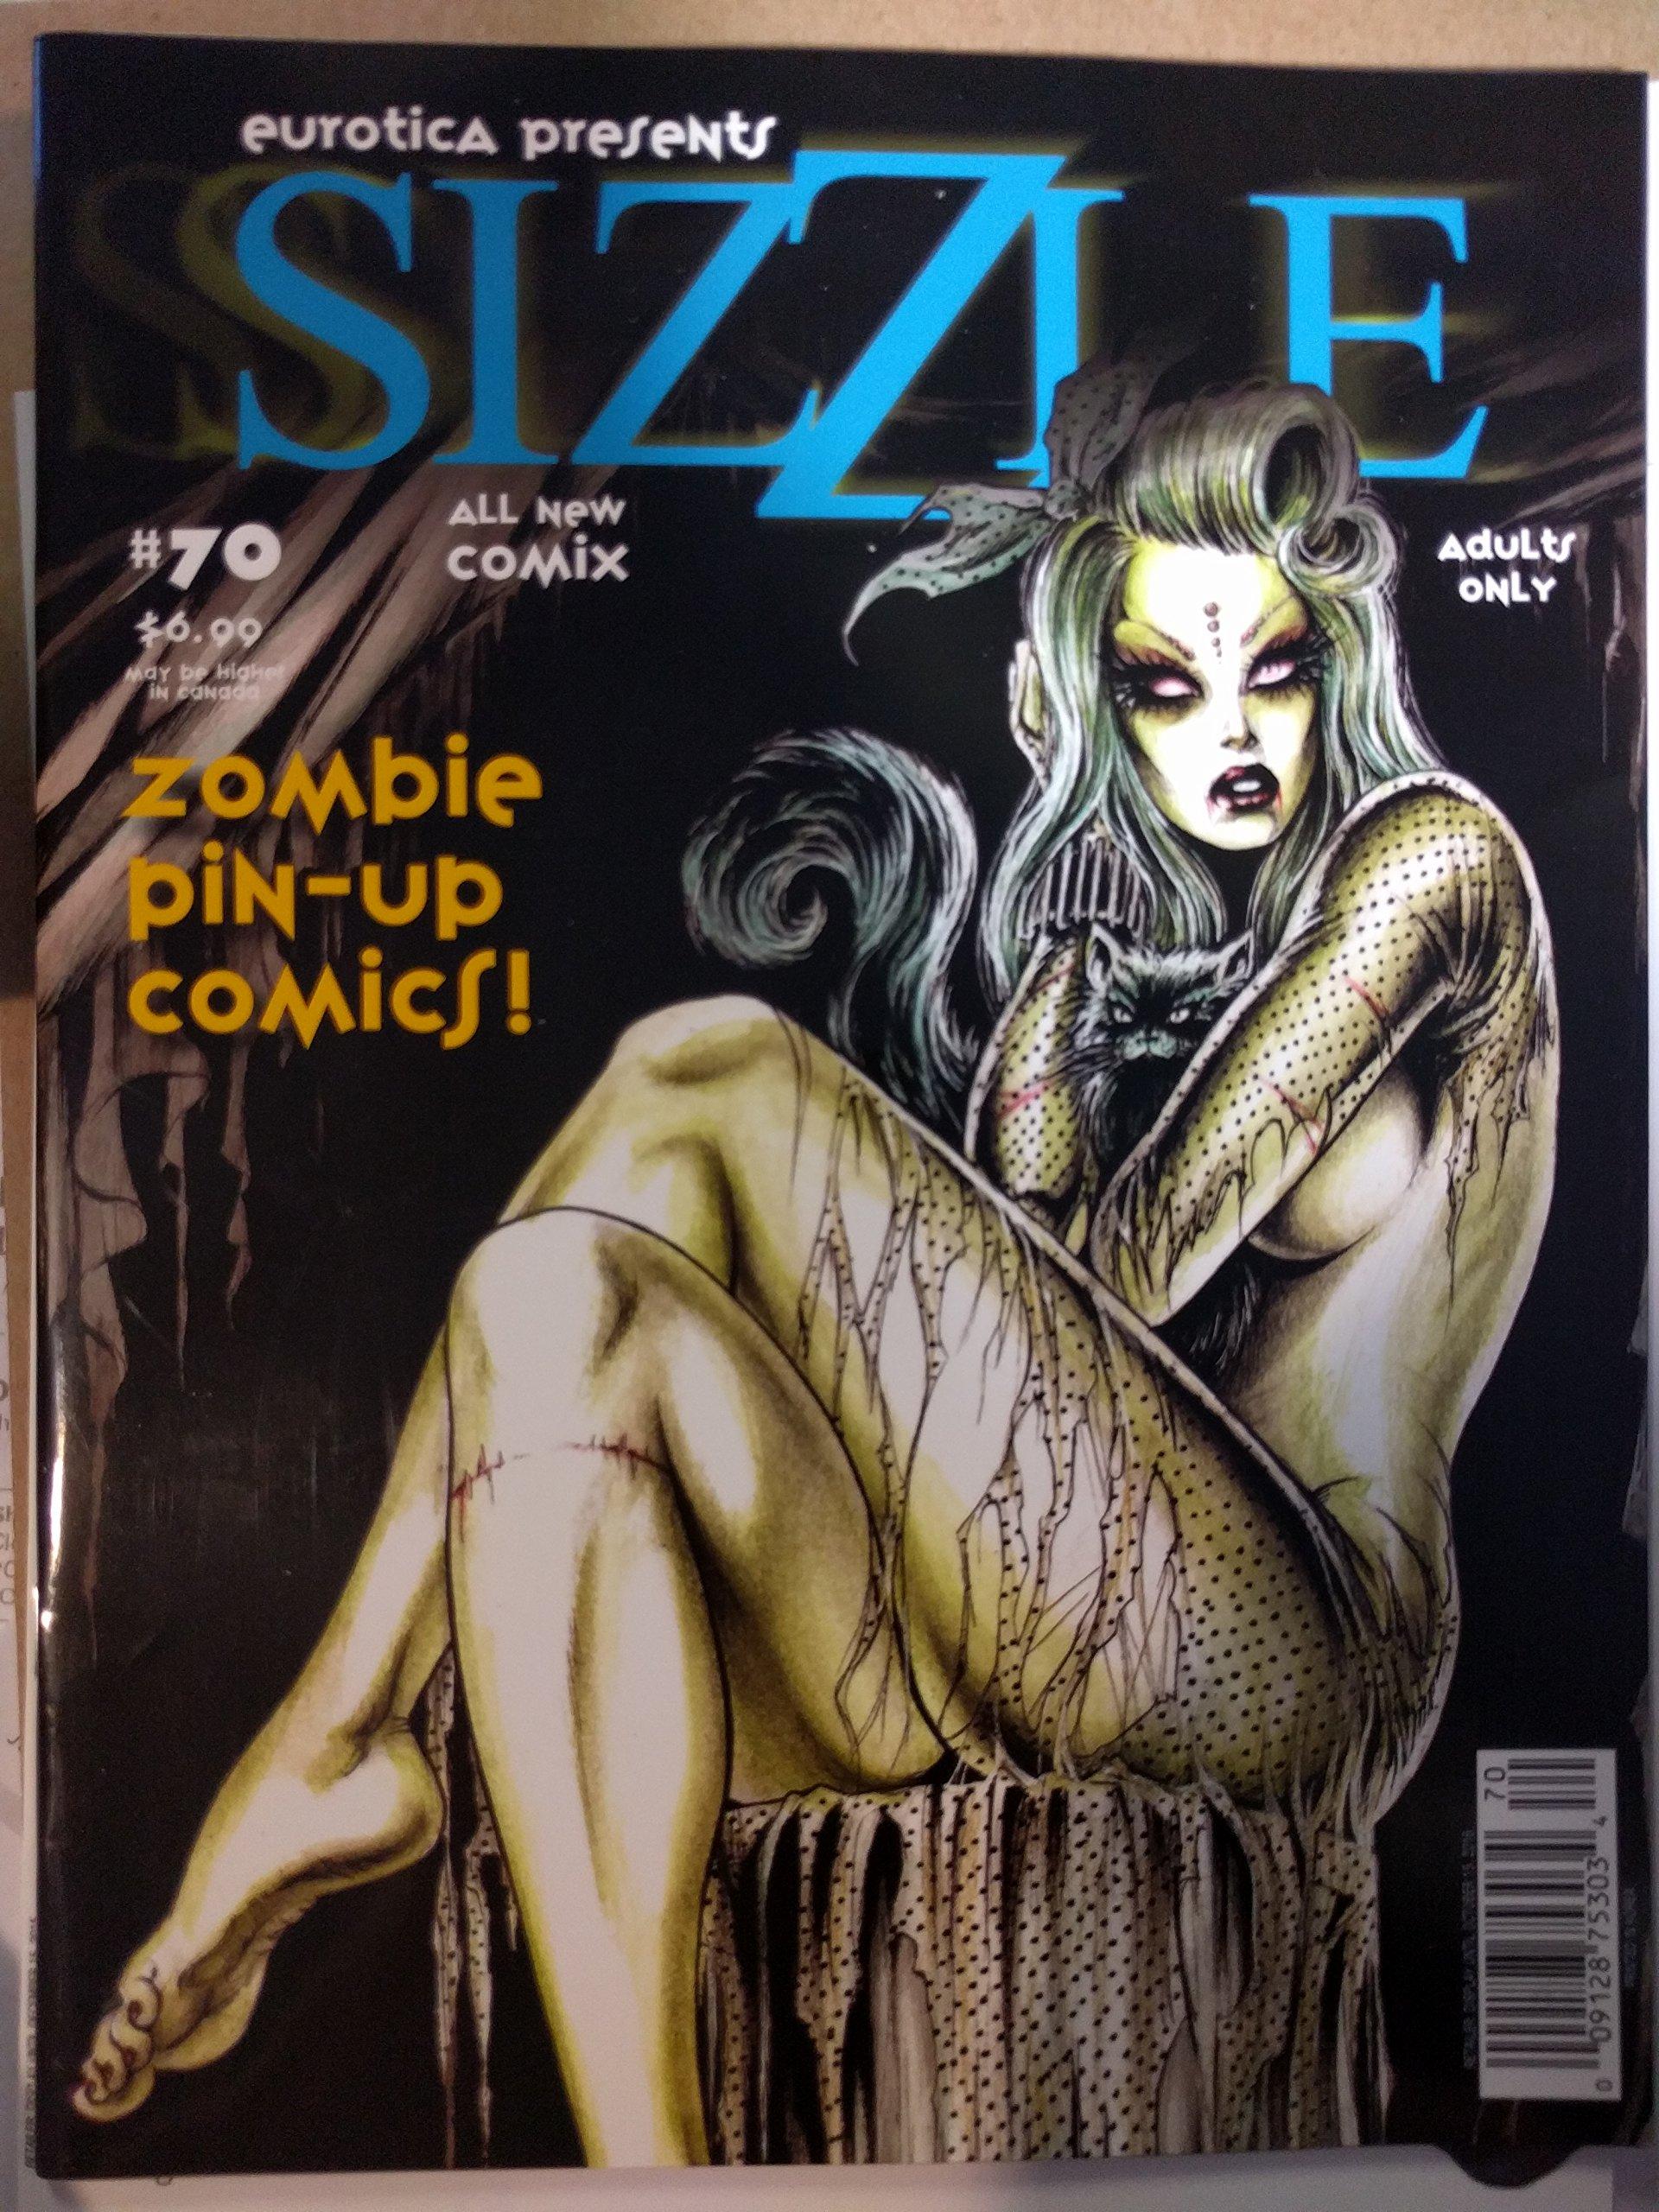 Read Online eurotica presents SIZZLE #70 pdf epub